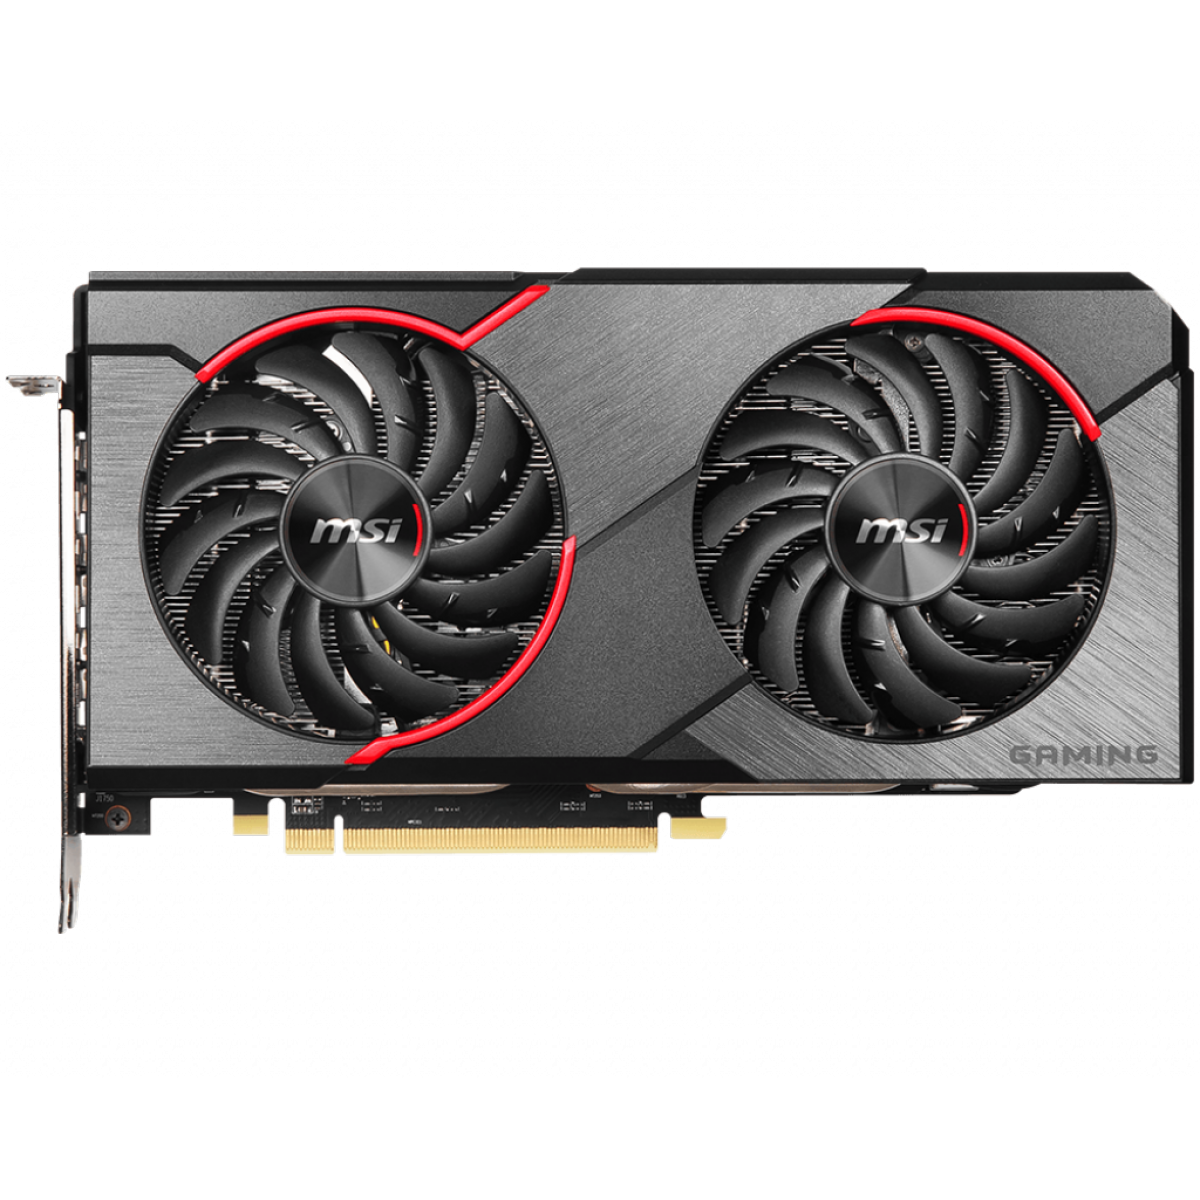 Placa de Vídeo MSI Radeon RX 5500 XT Gaming X Dual, 8GB GDDR6, 128Bit, 912-V382-001